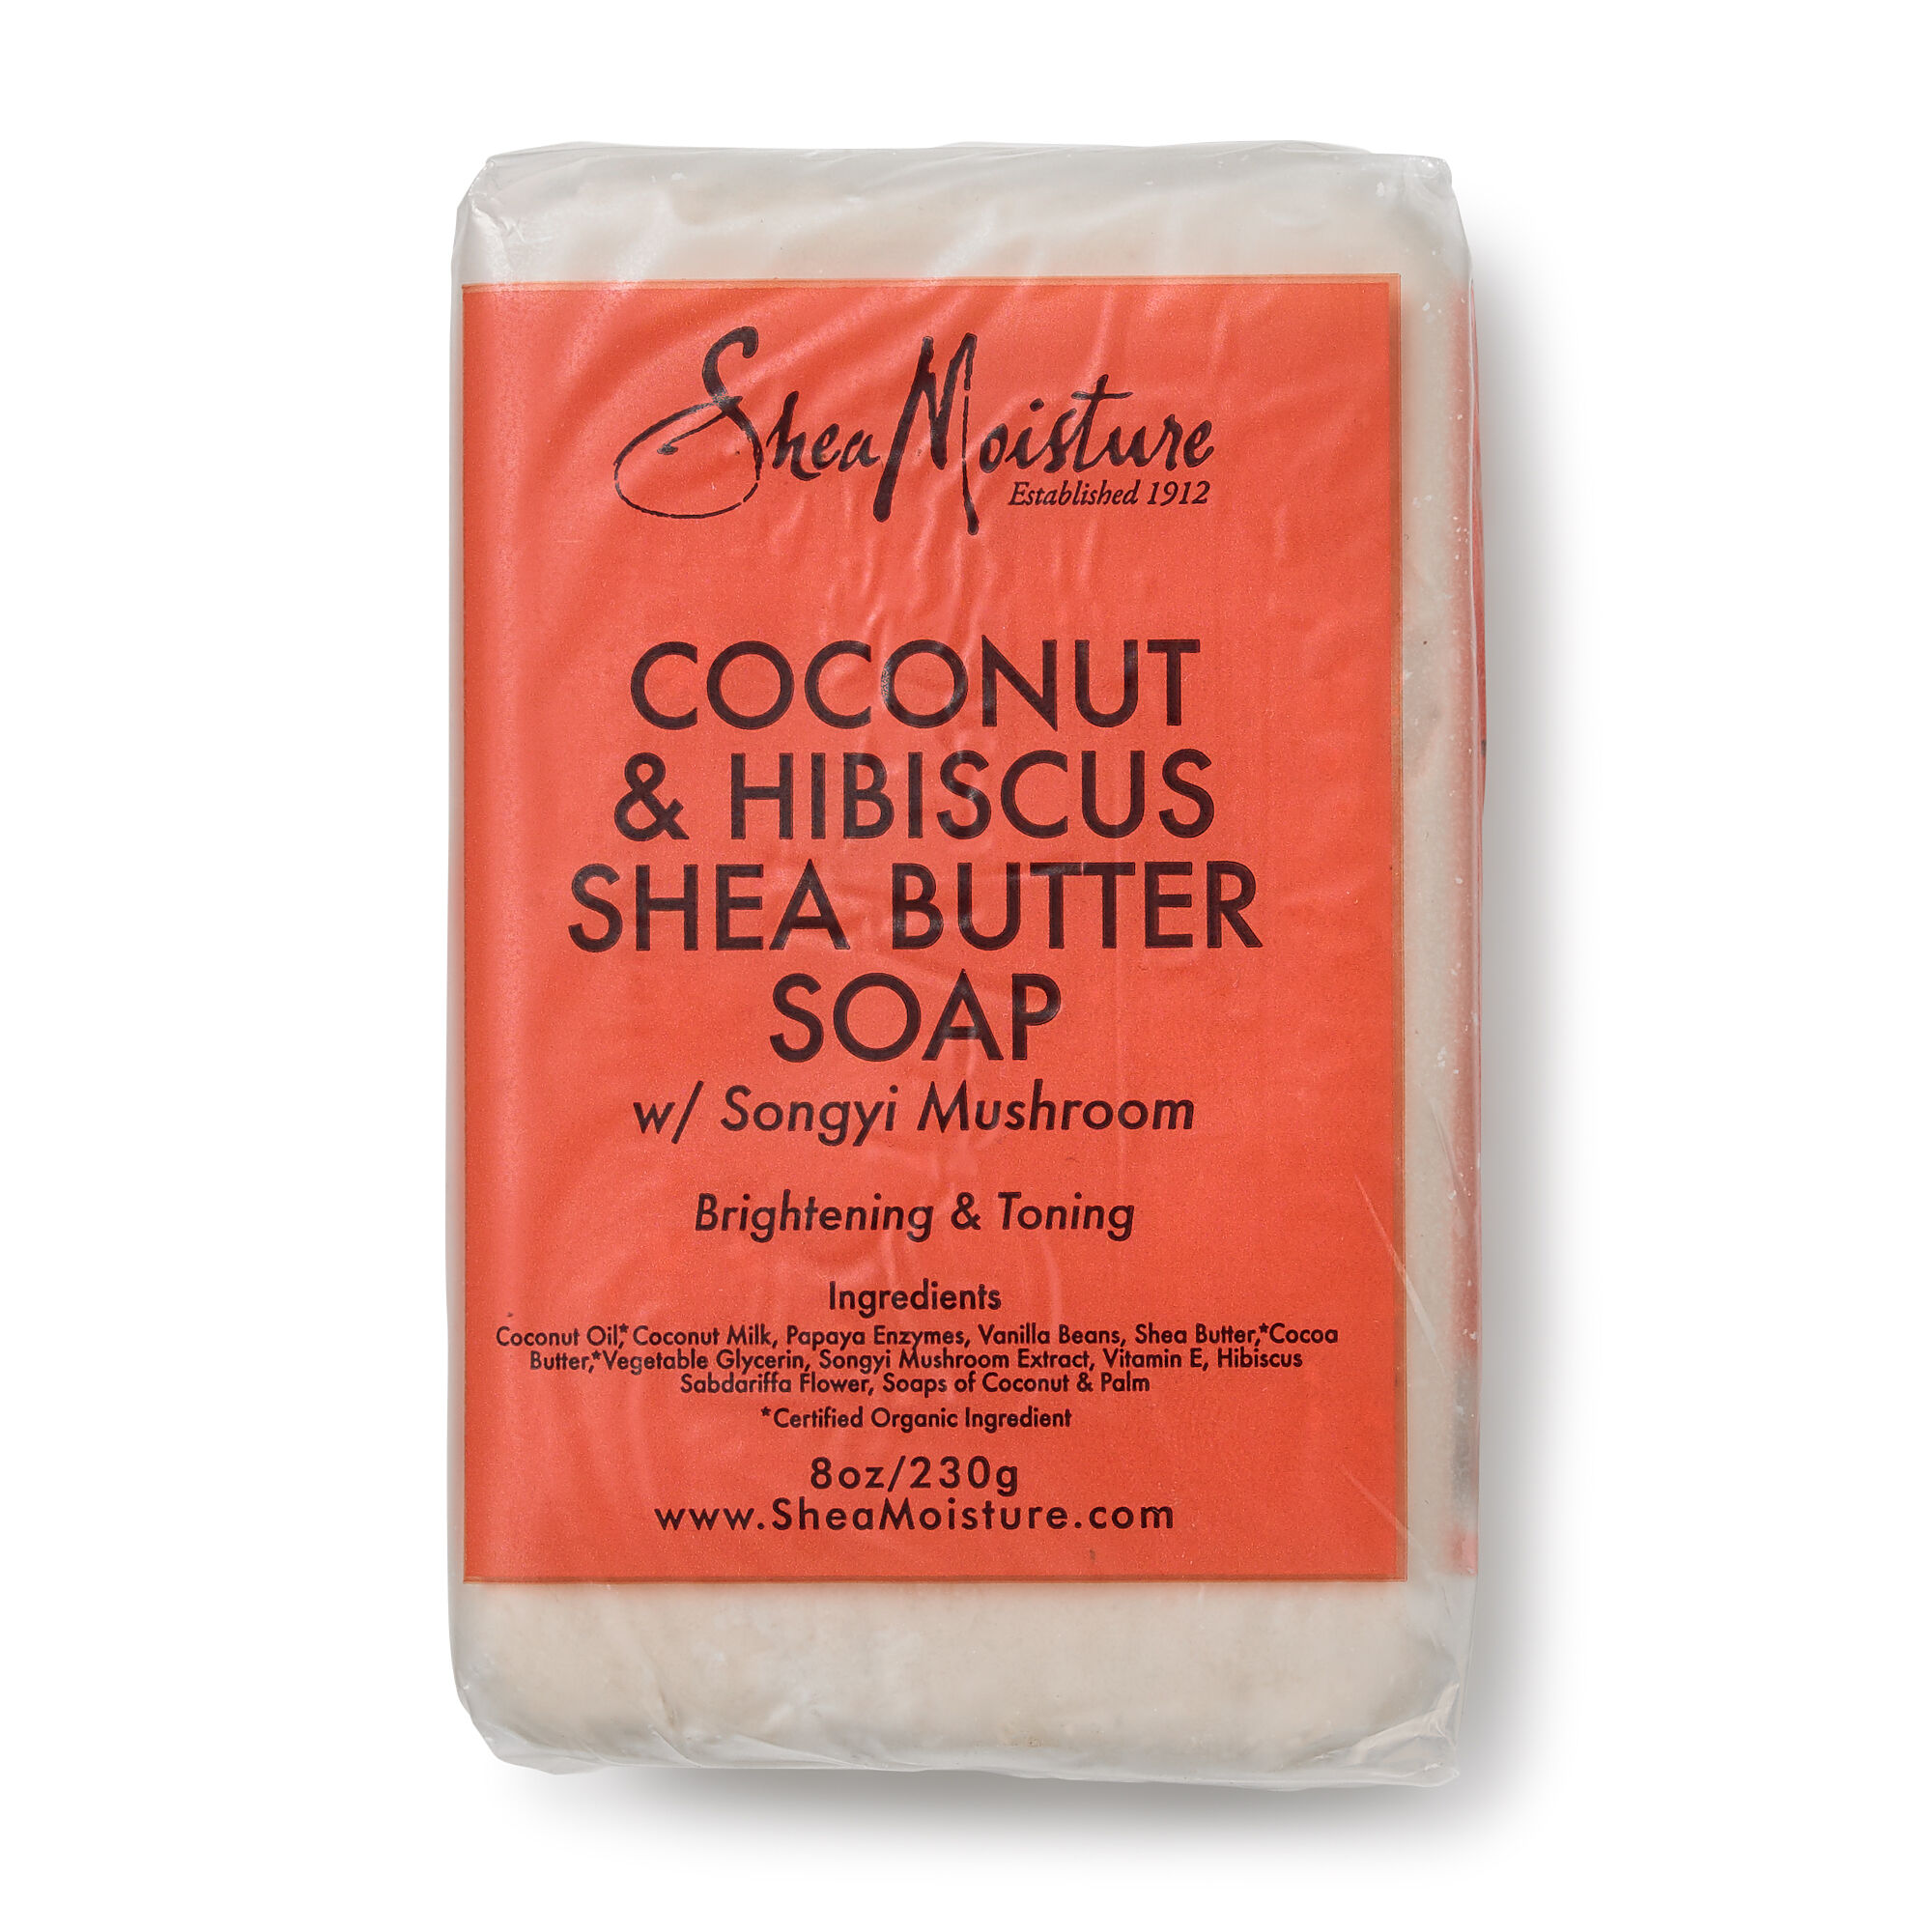 Shea Moisture Coconut Hibiscus Shea Butter Soap Gnc